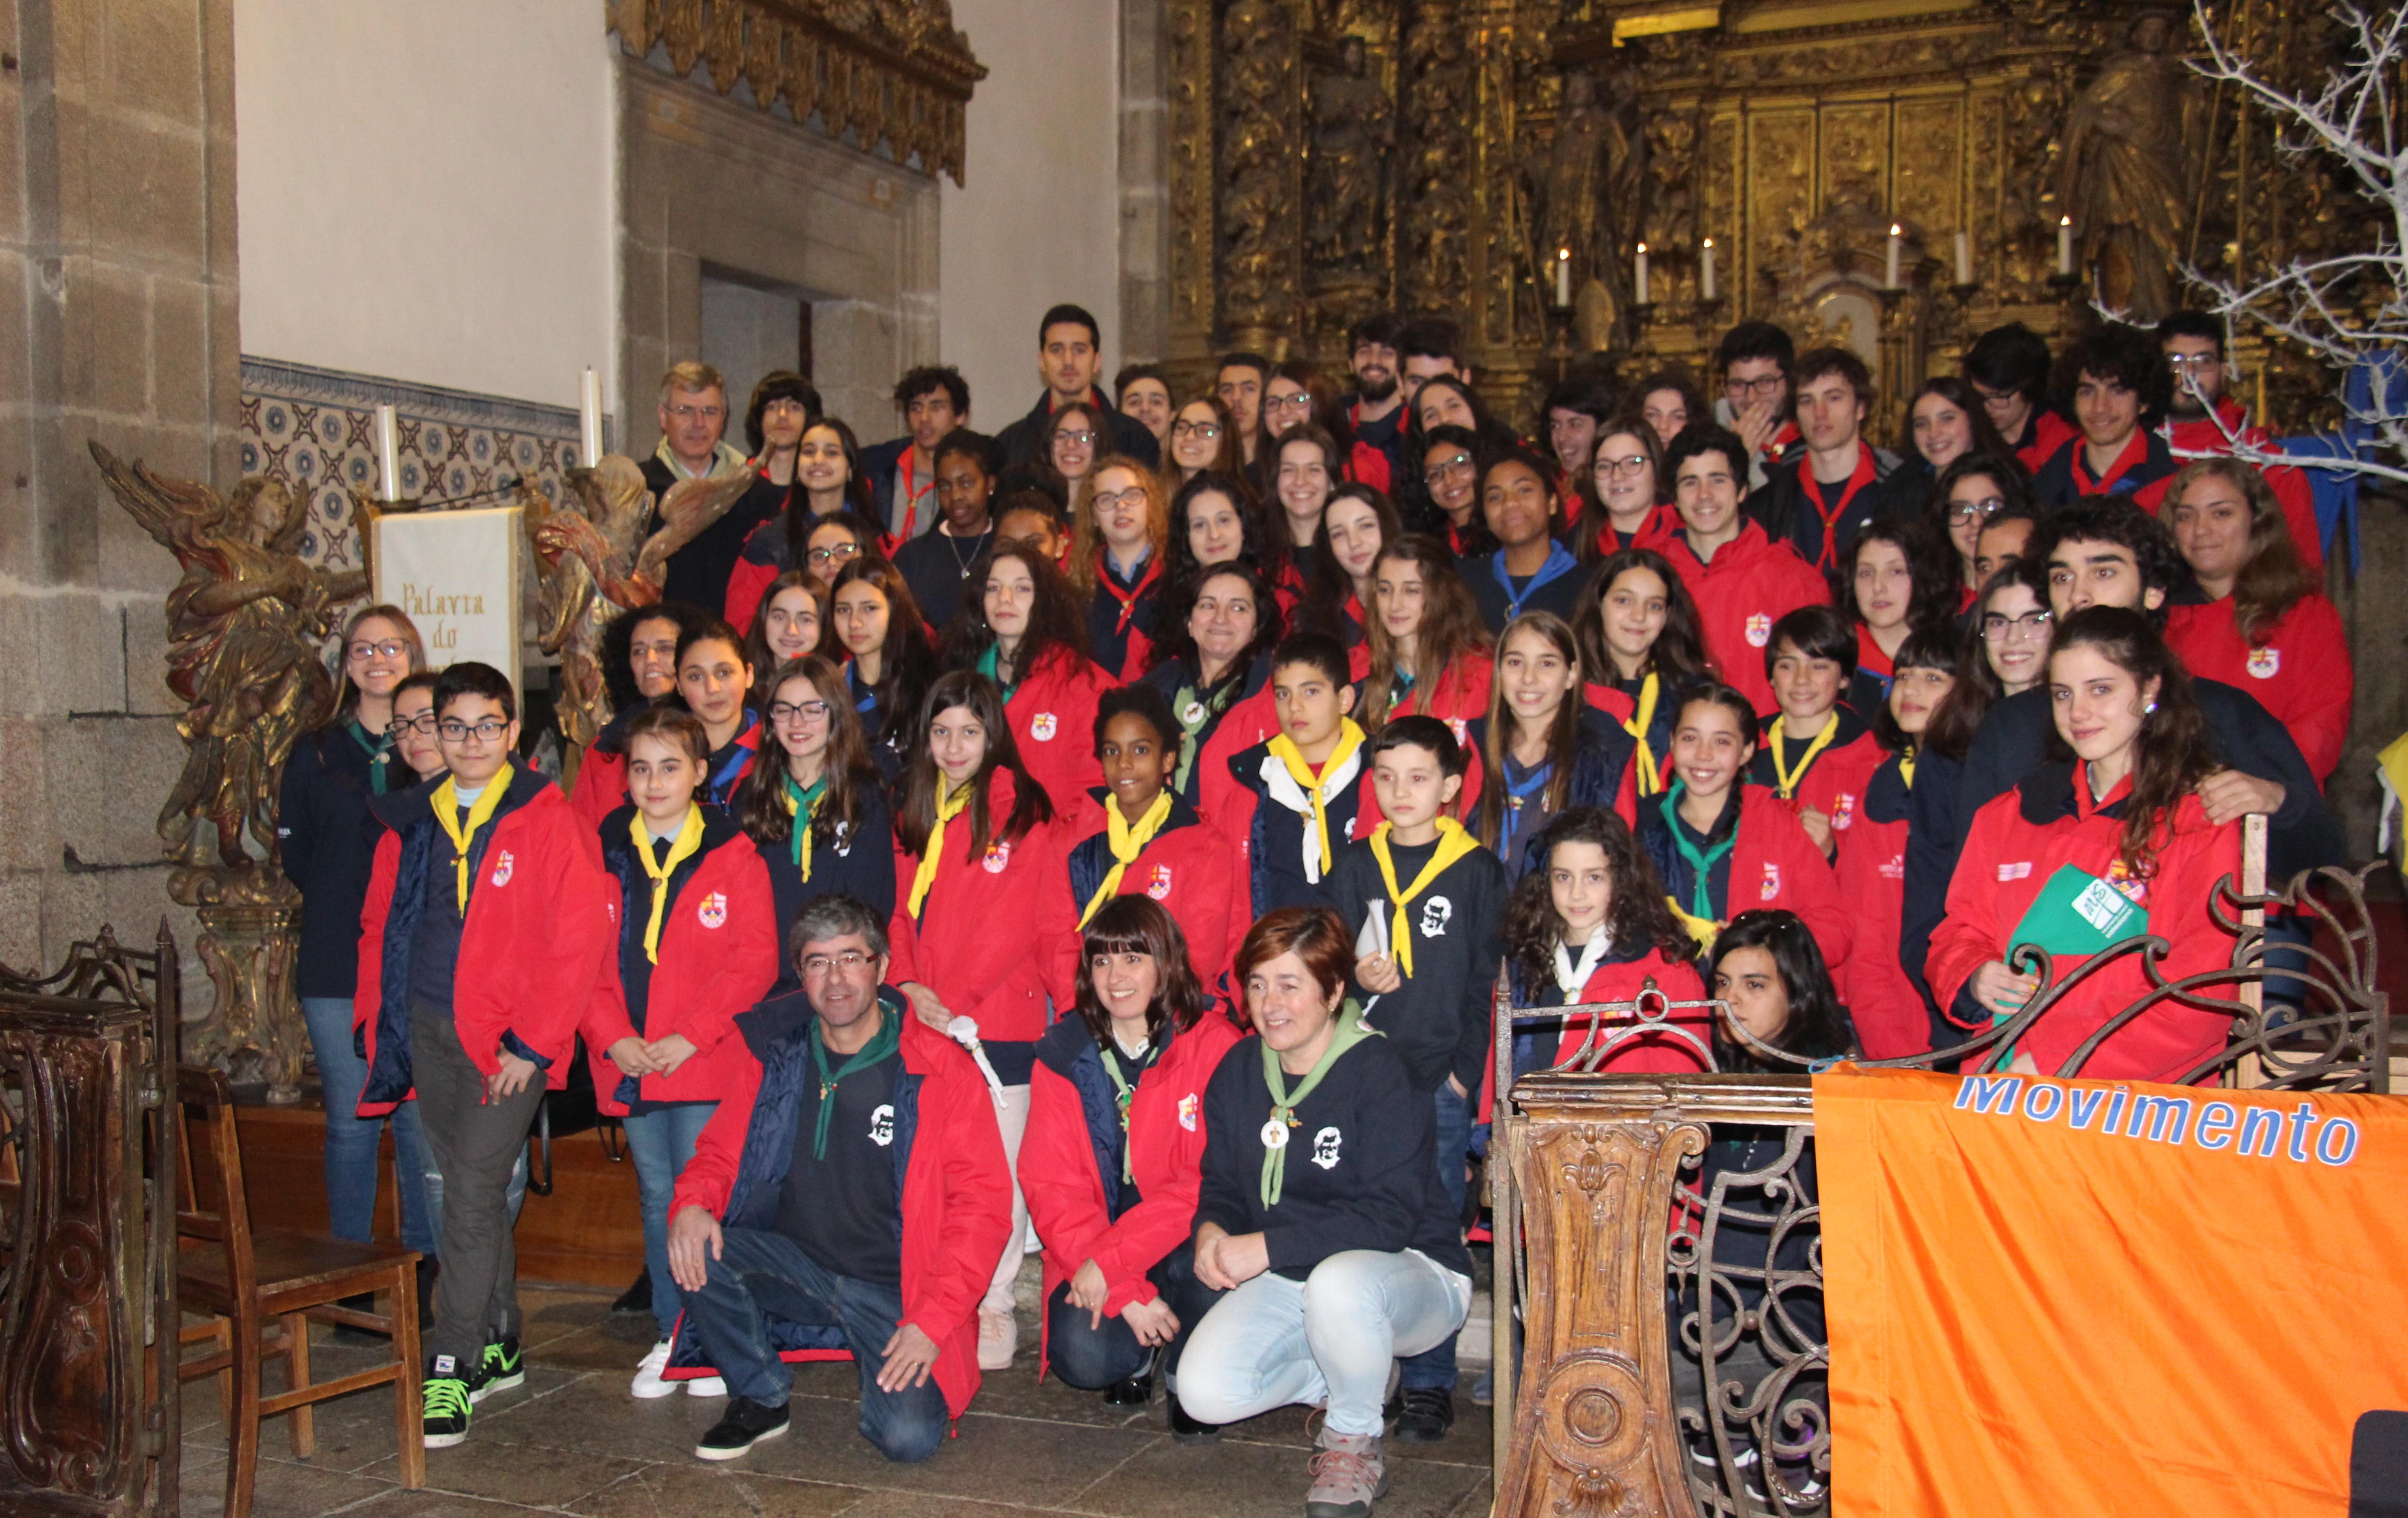 Movimento Juvenil Salesiano em festa de compromisso